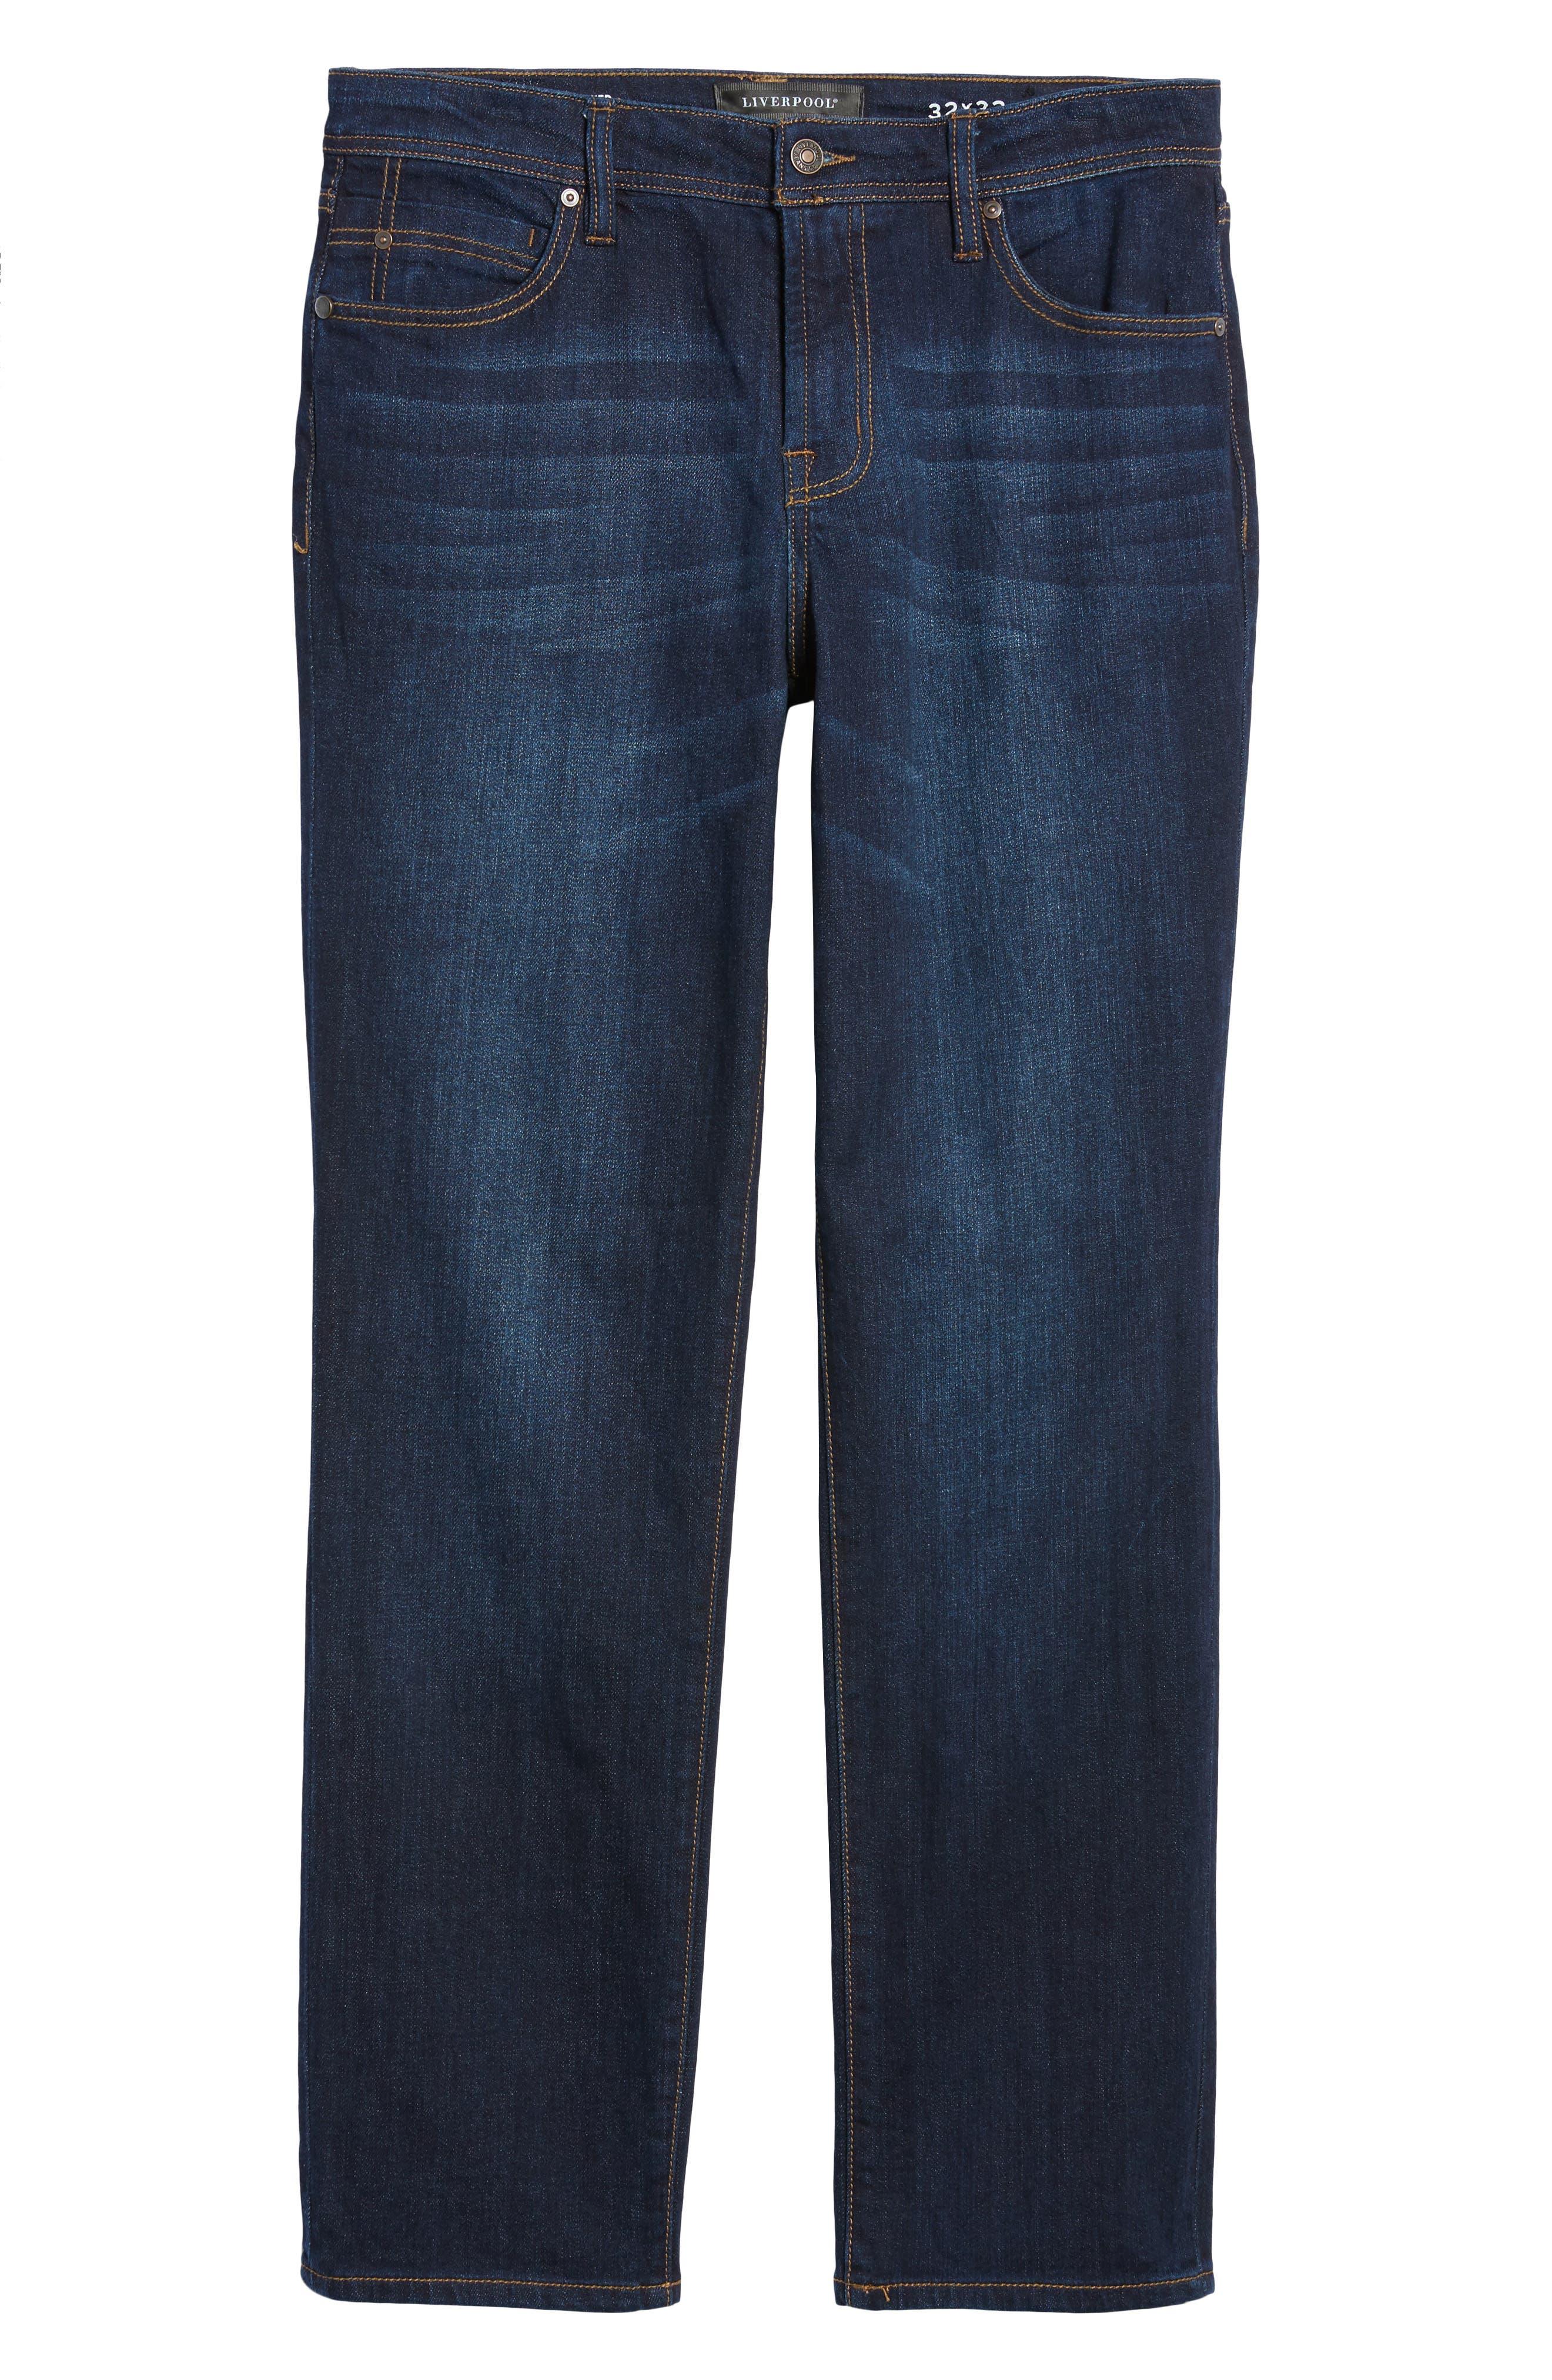 Jeans Co. Regent Relaxed Fit Jeans,                             Alternate thumbnail 6, color,                             SAN ARDO VINTAGE DARK